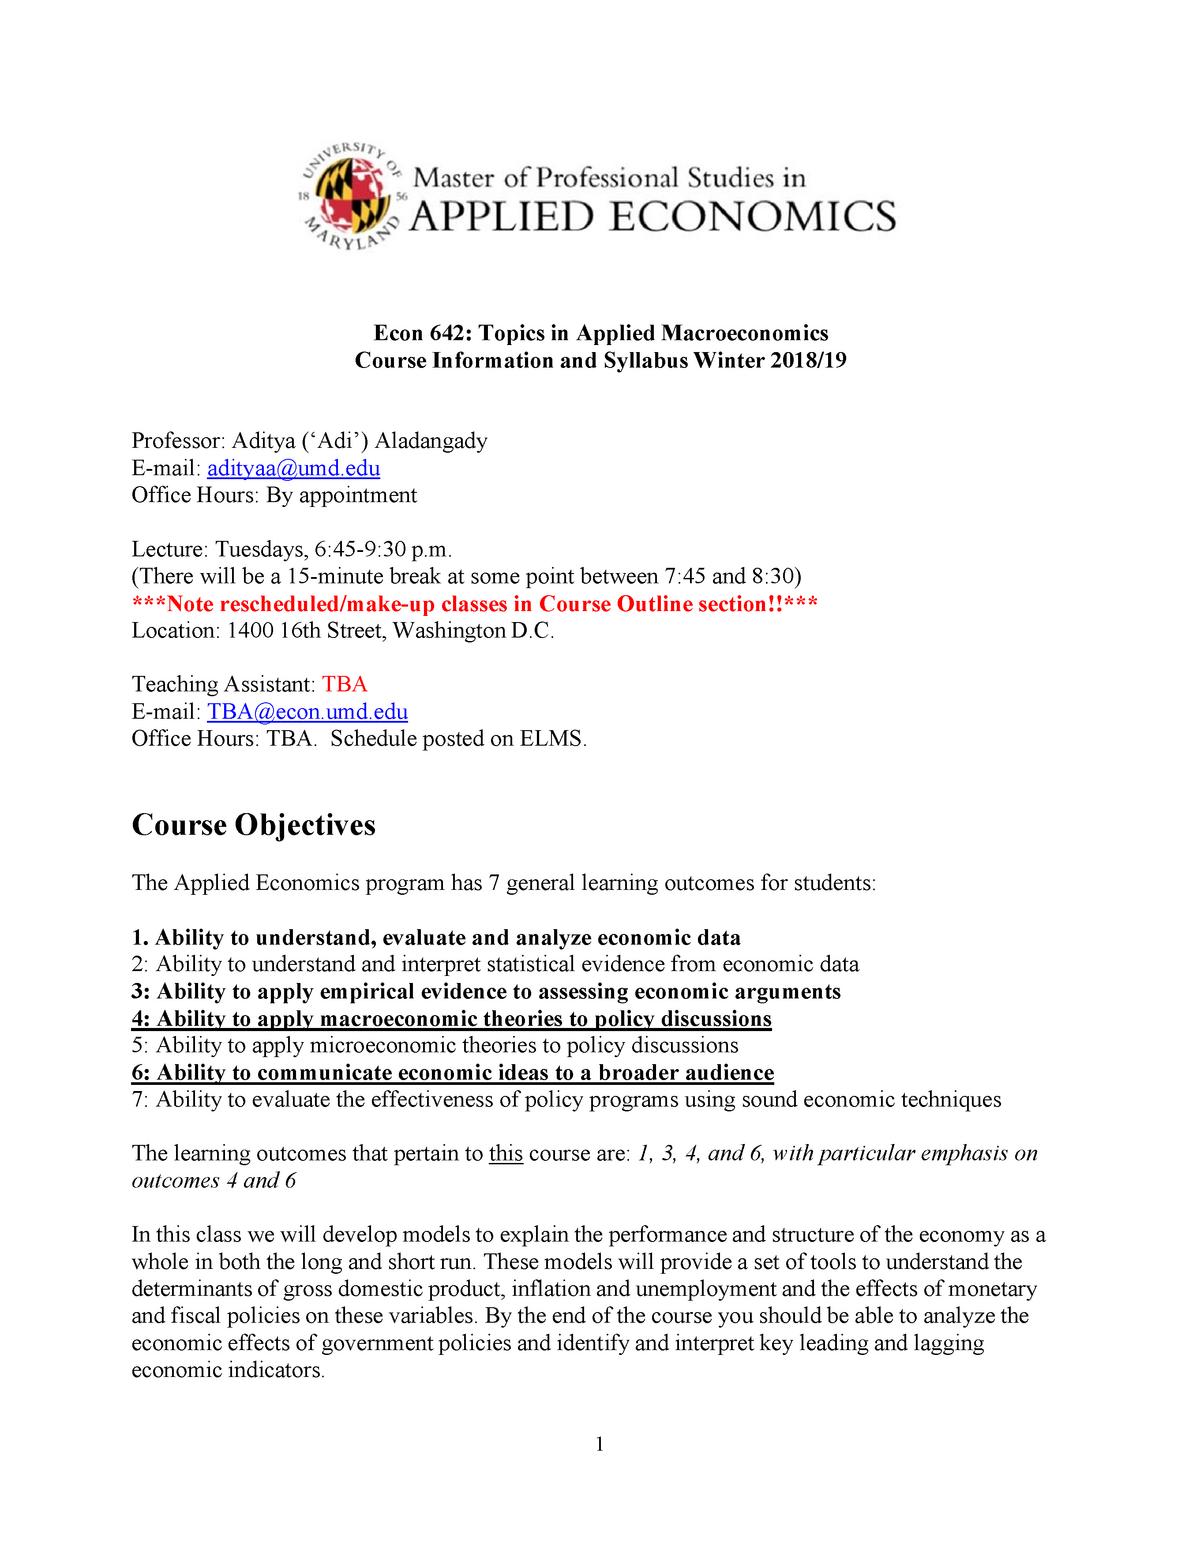 ECON 642 Syllabus - ECON423: Econometrics II - StuDocu